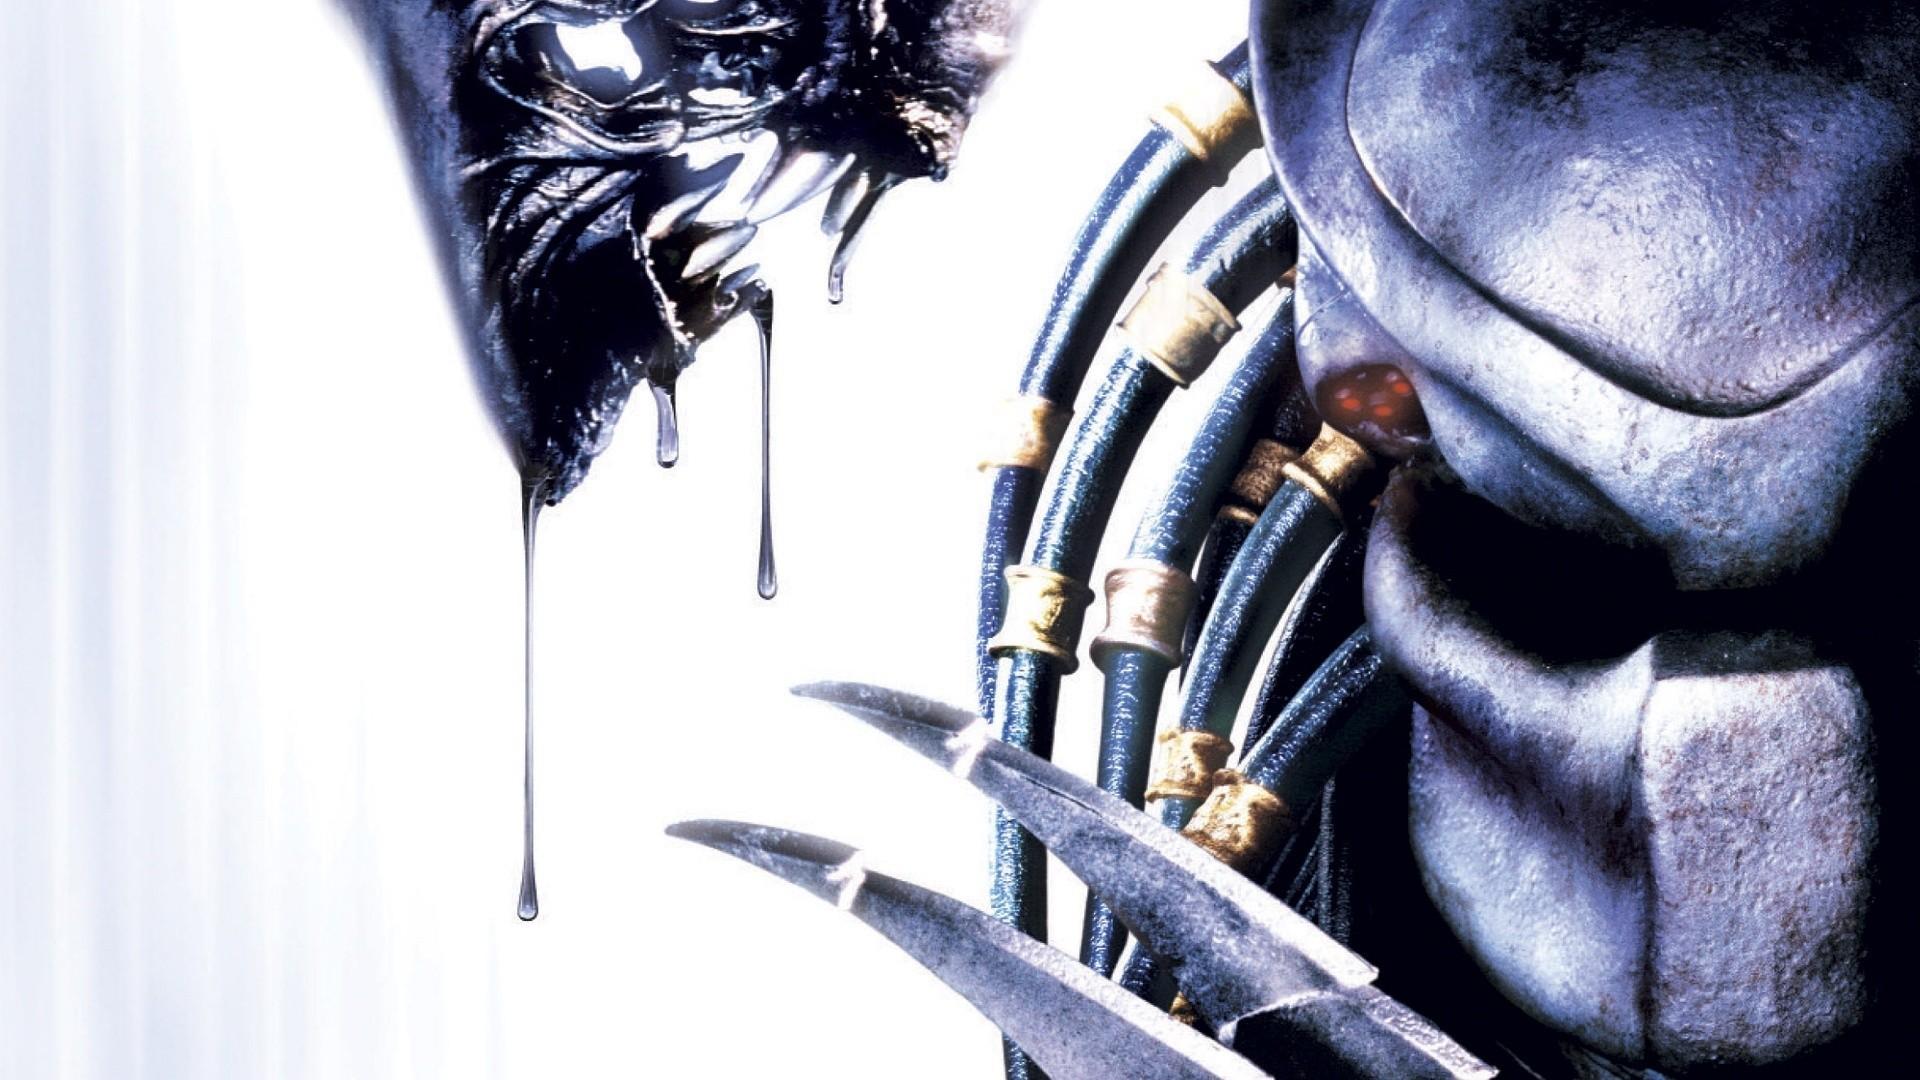 Alien Vs Predator Wallpaper 4